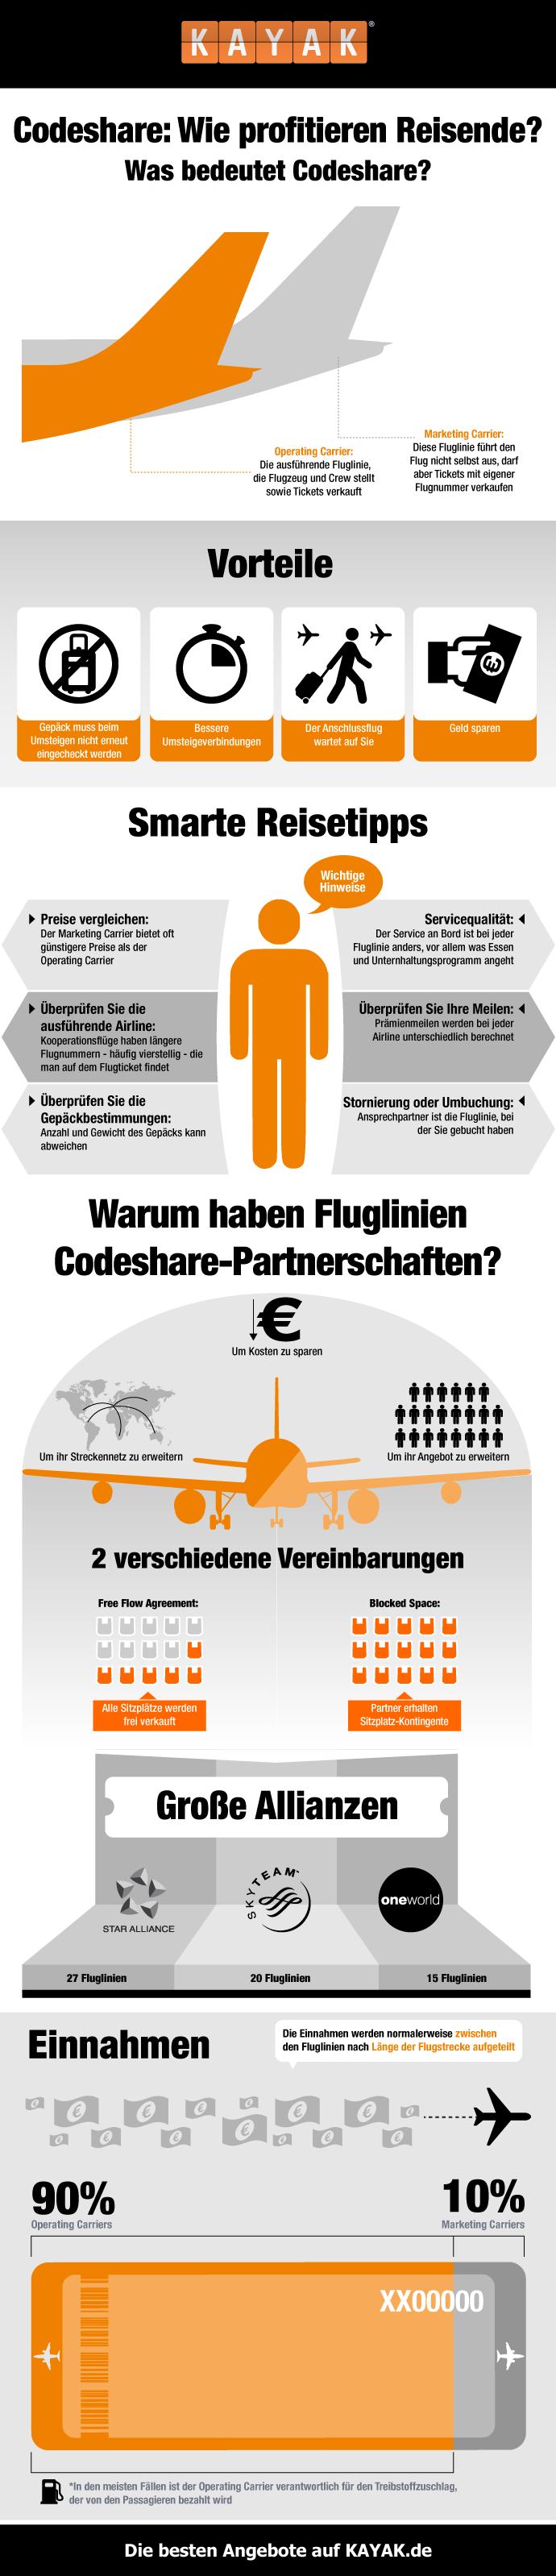 infographic_DE-4